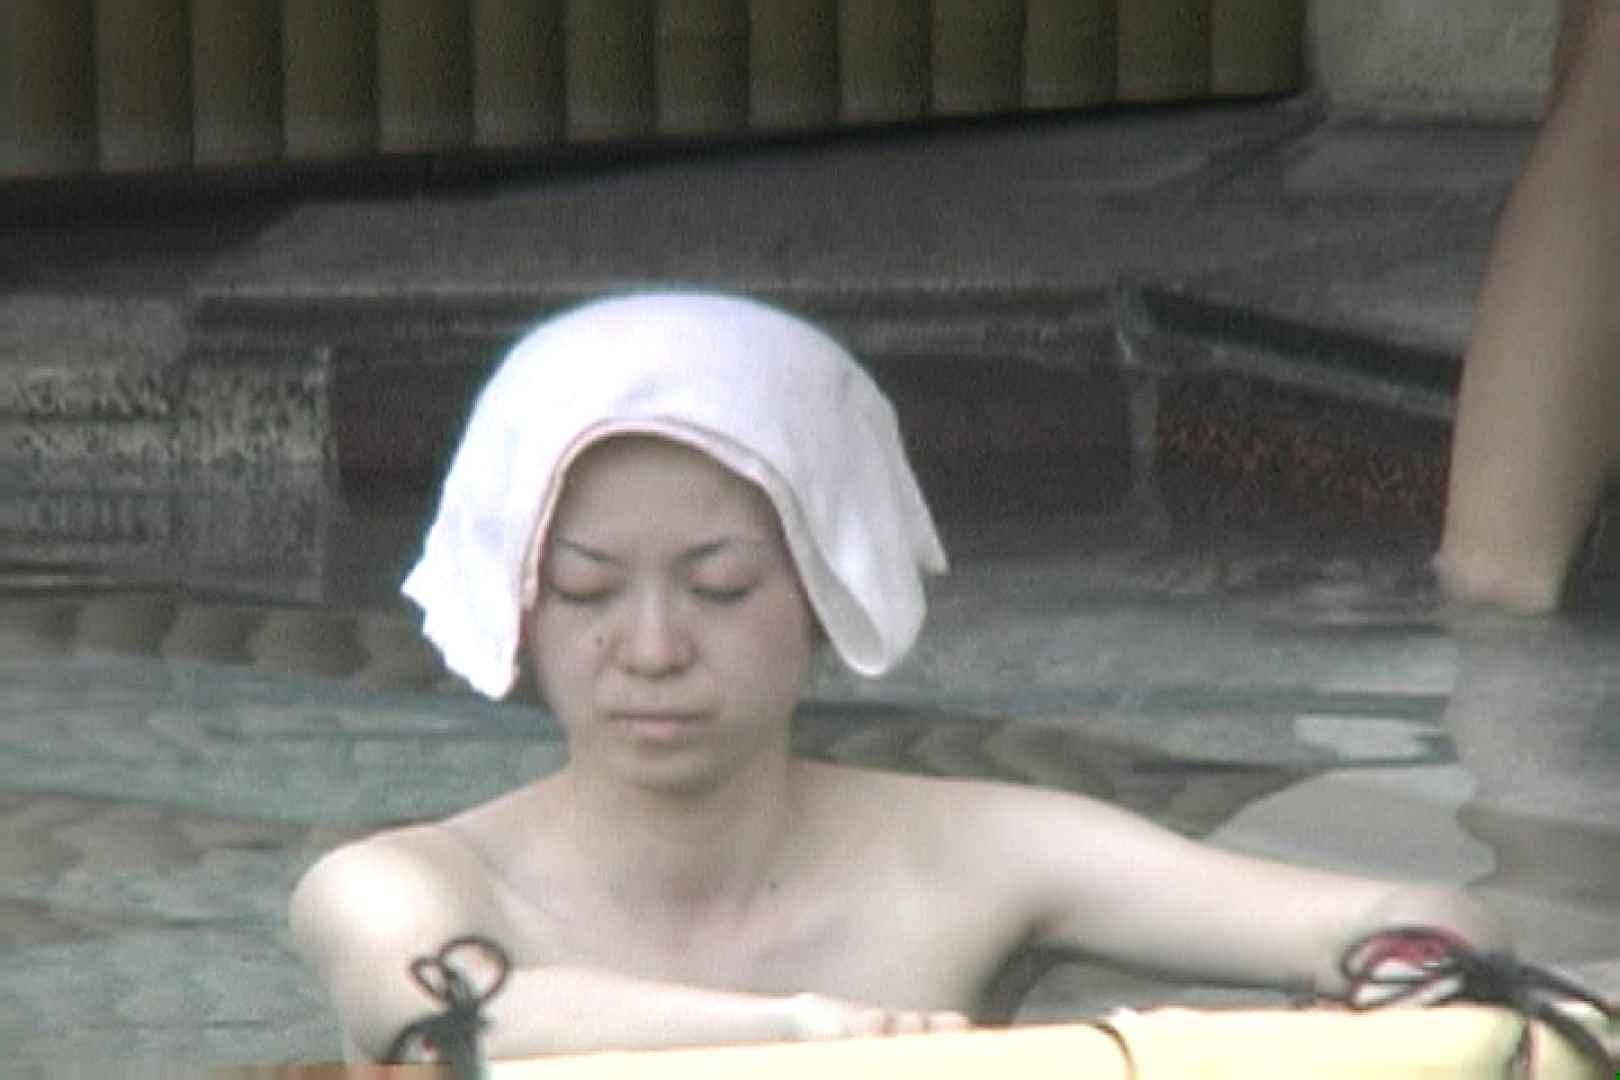 Aquaな露天風呂Vol.693 露天風呂編 | 盗撮シリーズ  105PIX 25